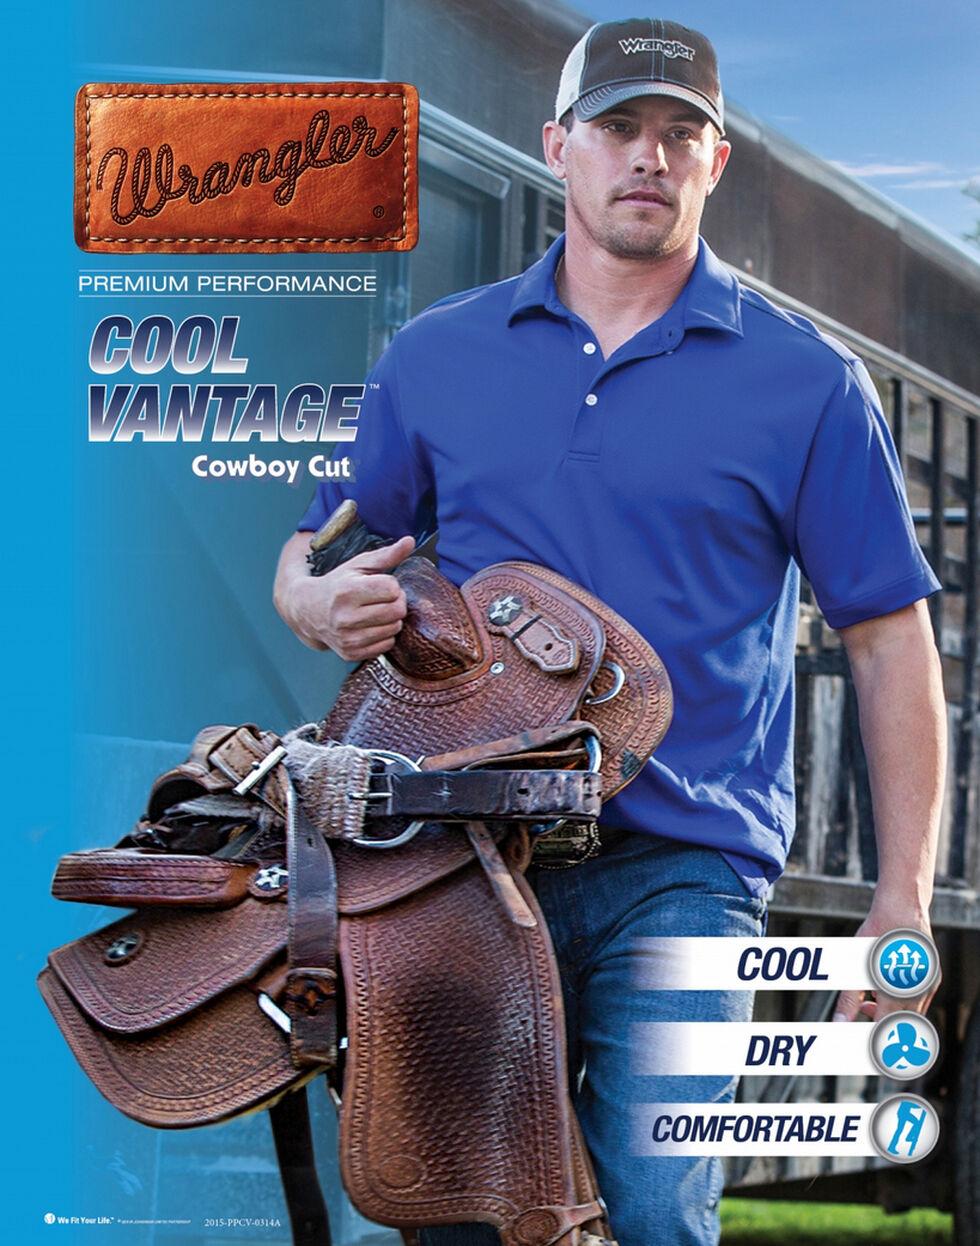 Wrangler Men's Cool Vantage Premium Performance Cowboy Cut Slim Fit Jeans, Light Stone, hi-res